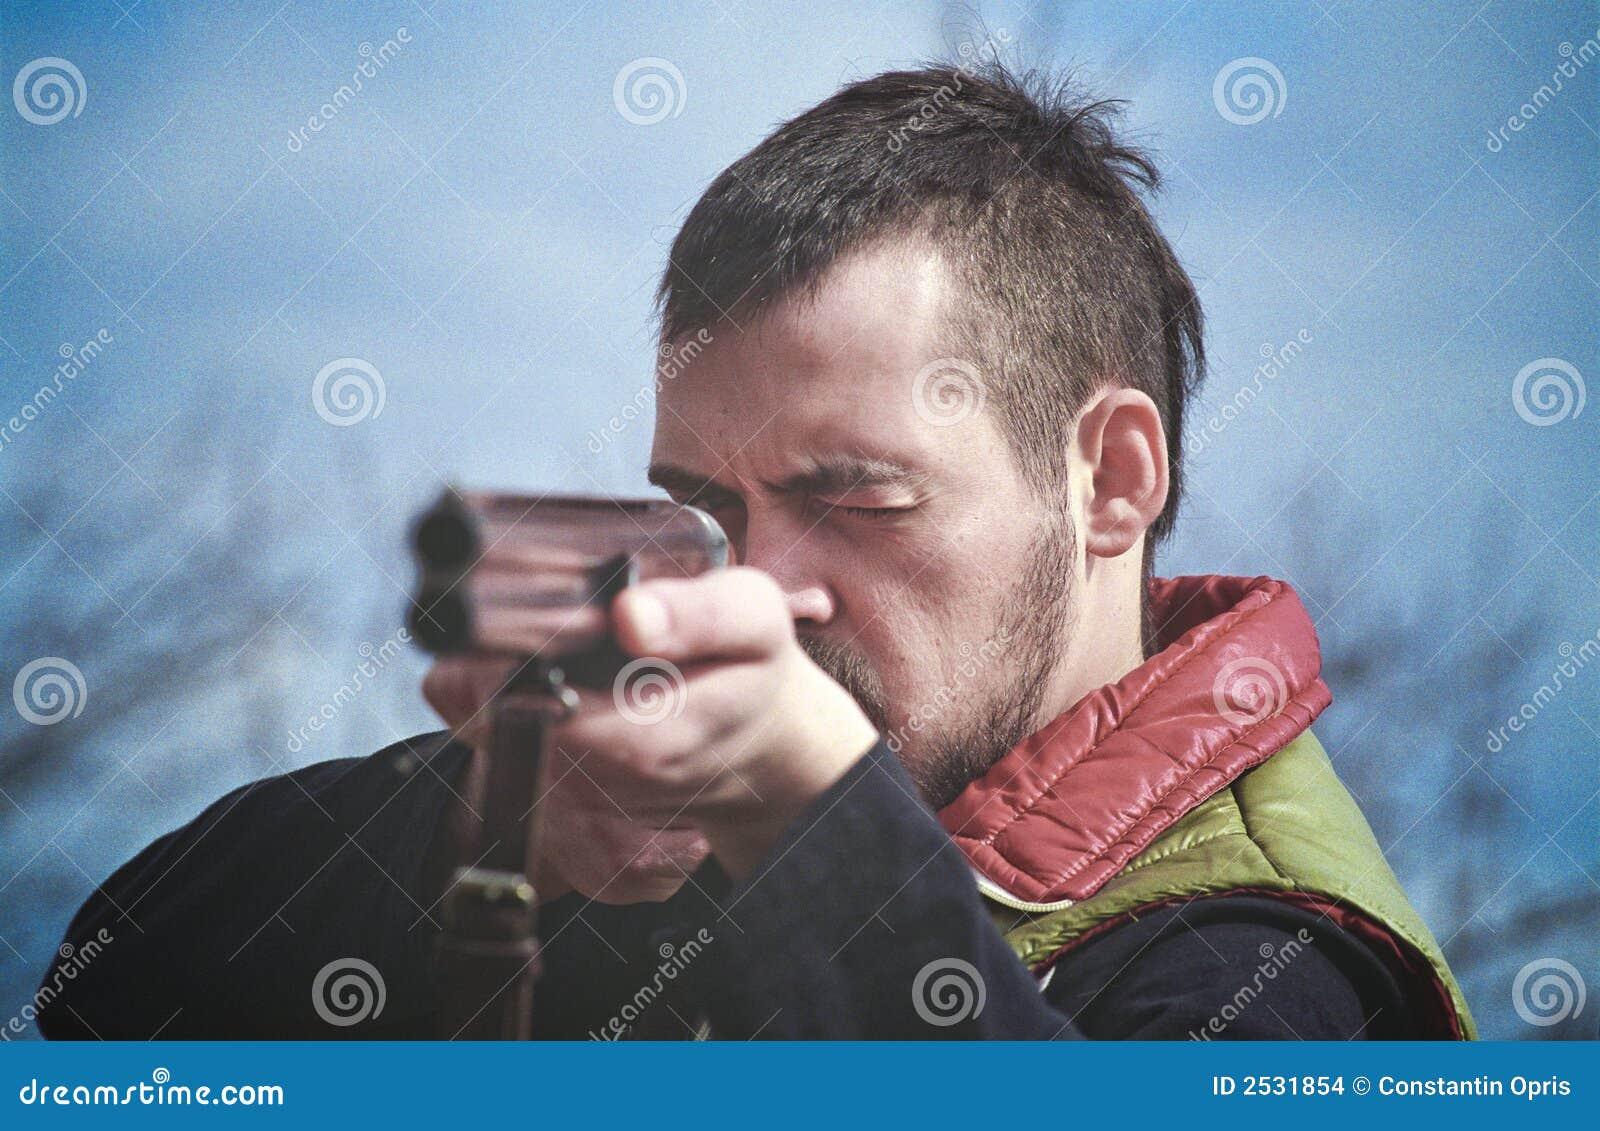 Aiming Shotgun Stock Images - Image: 2531854